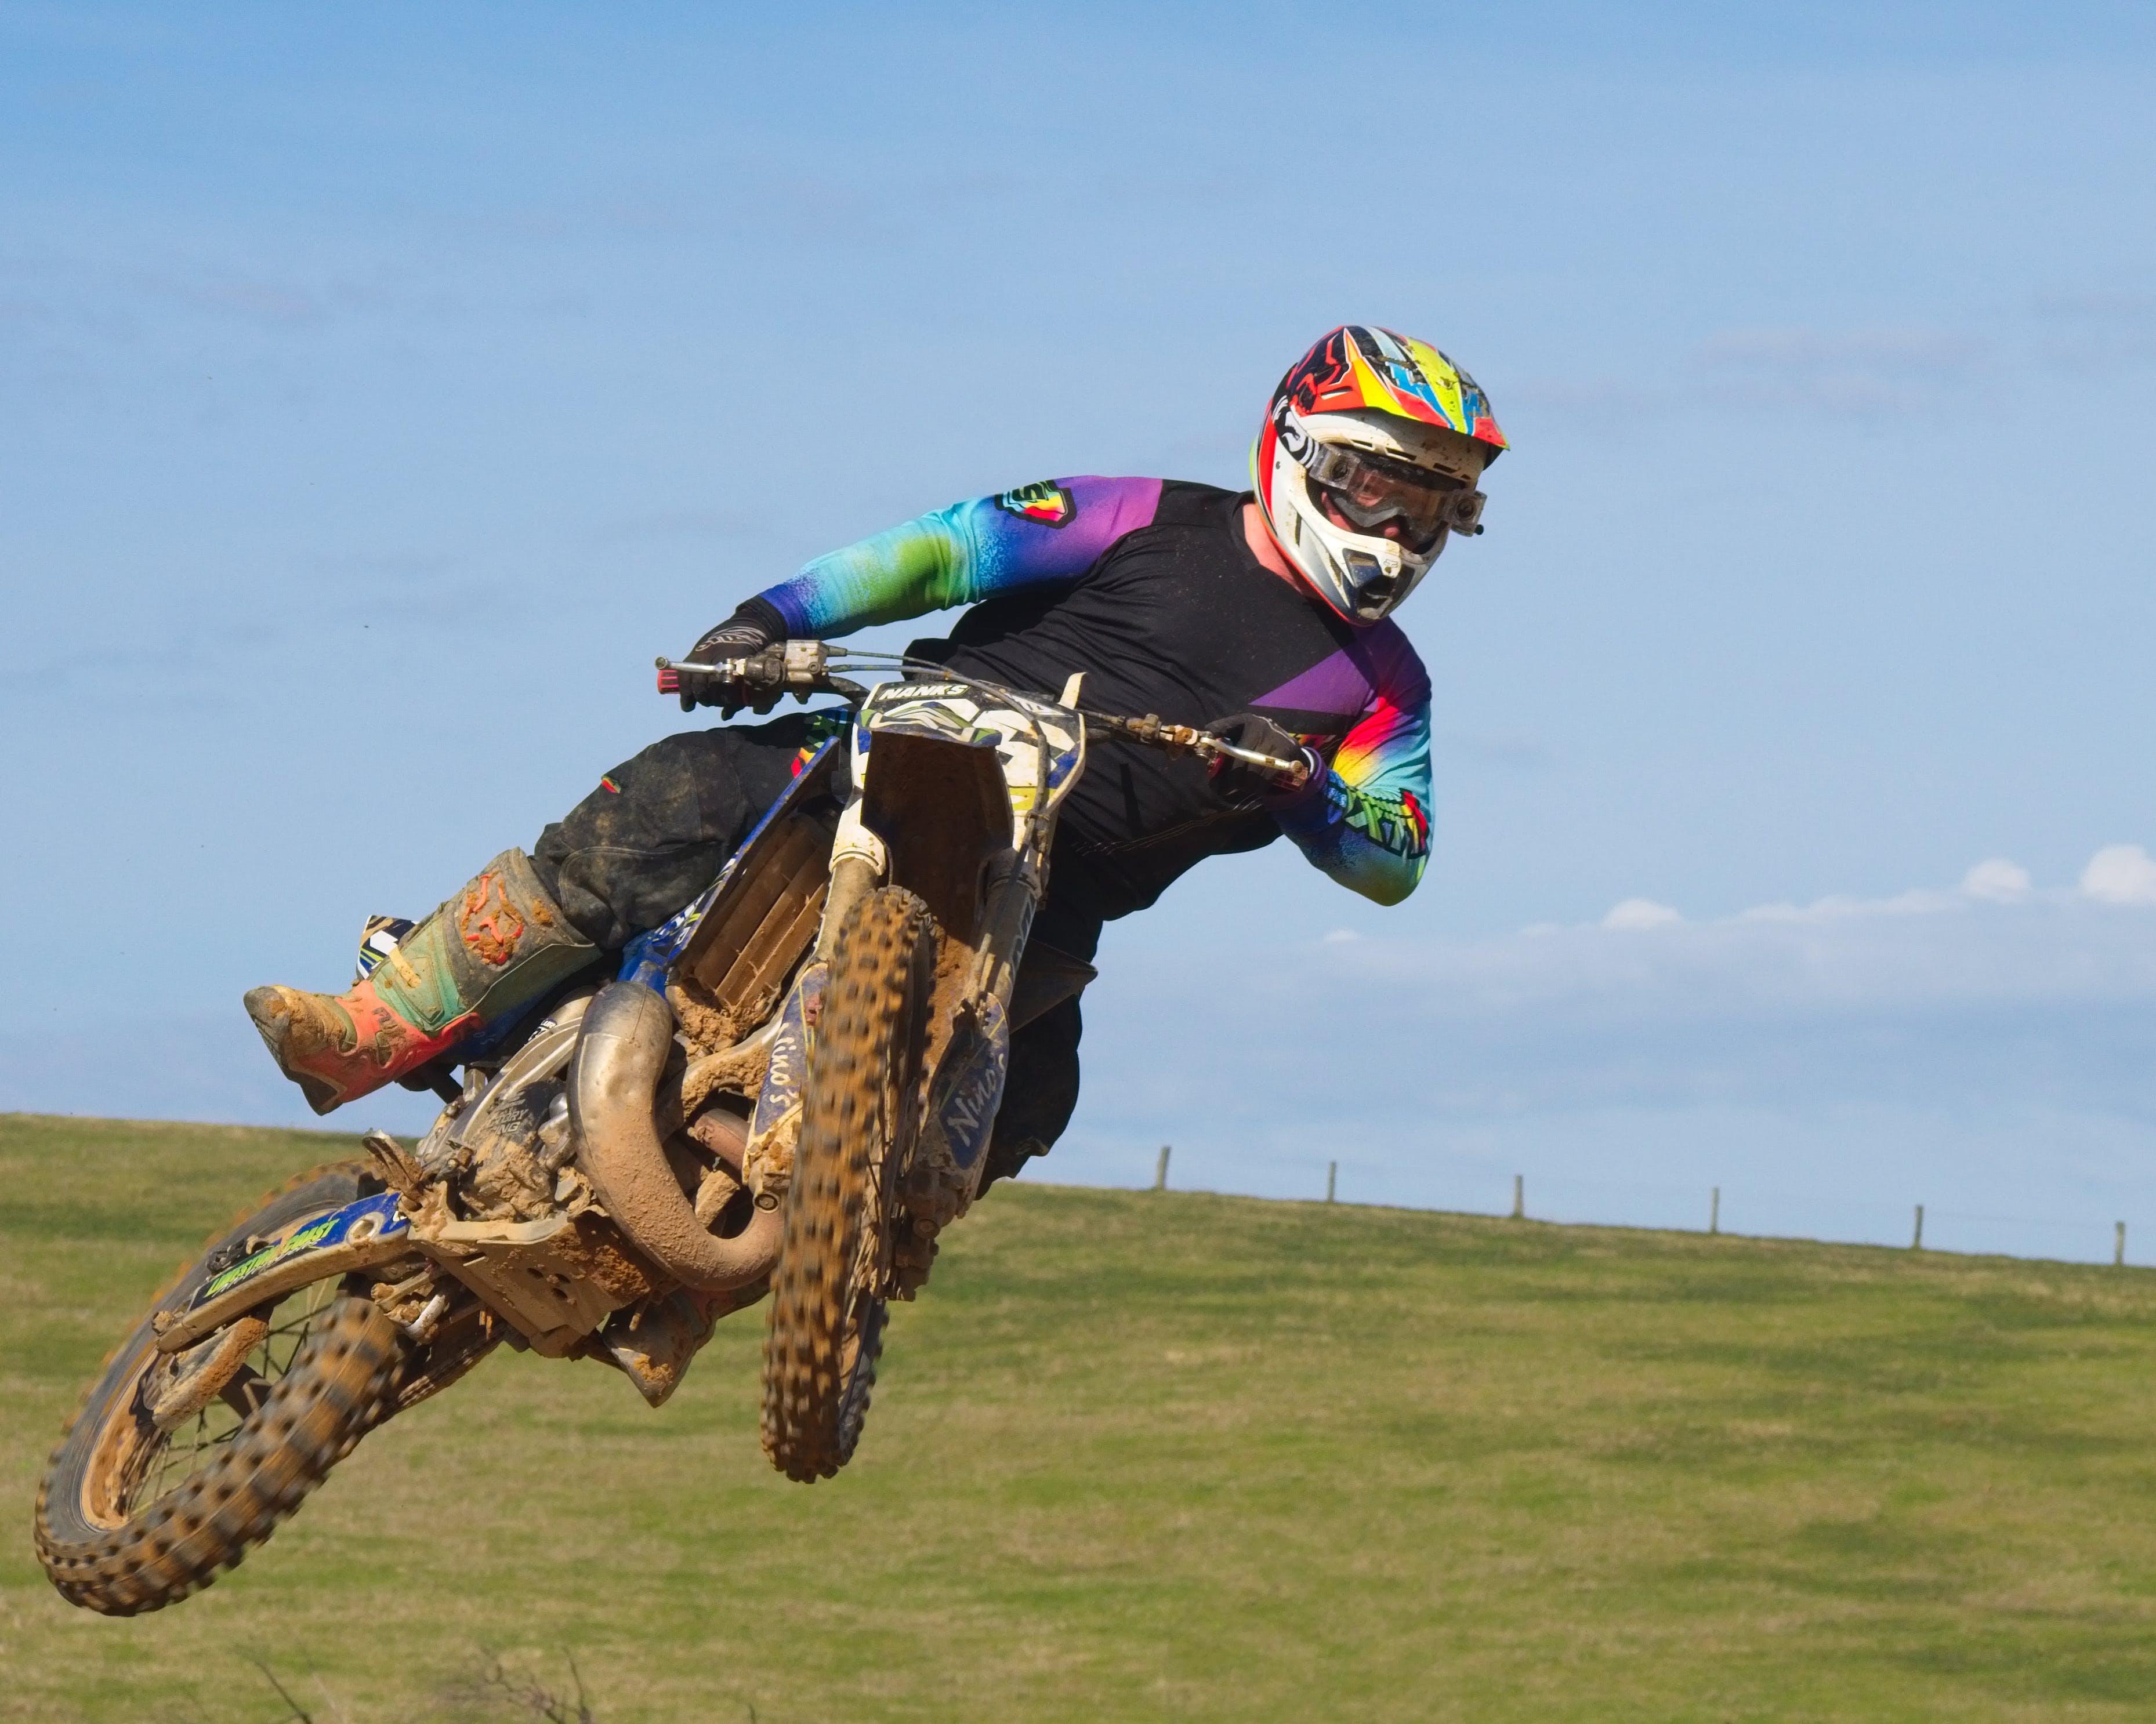 Kostenloses Stock Foto zu motocross, motorrad, sprung